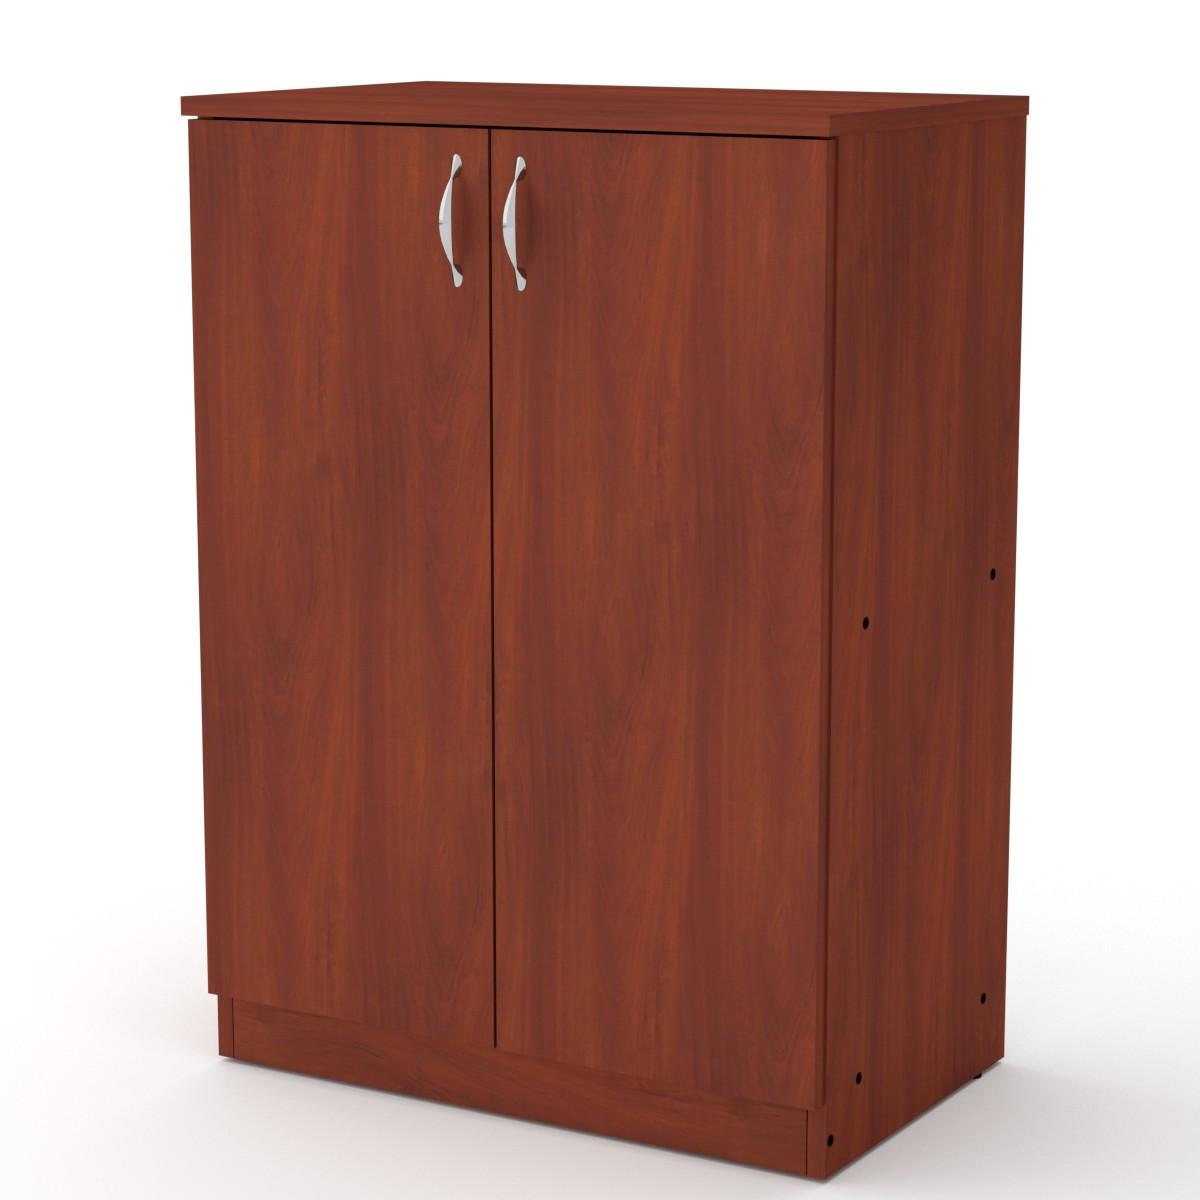 Шкаф книжный КШ-17 яблоня Компанит (61х37х84 см)